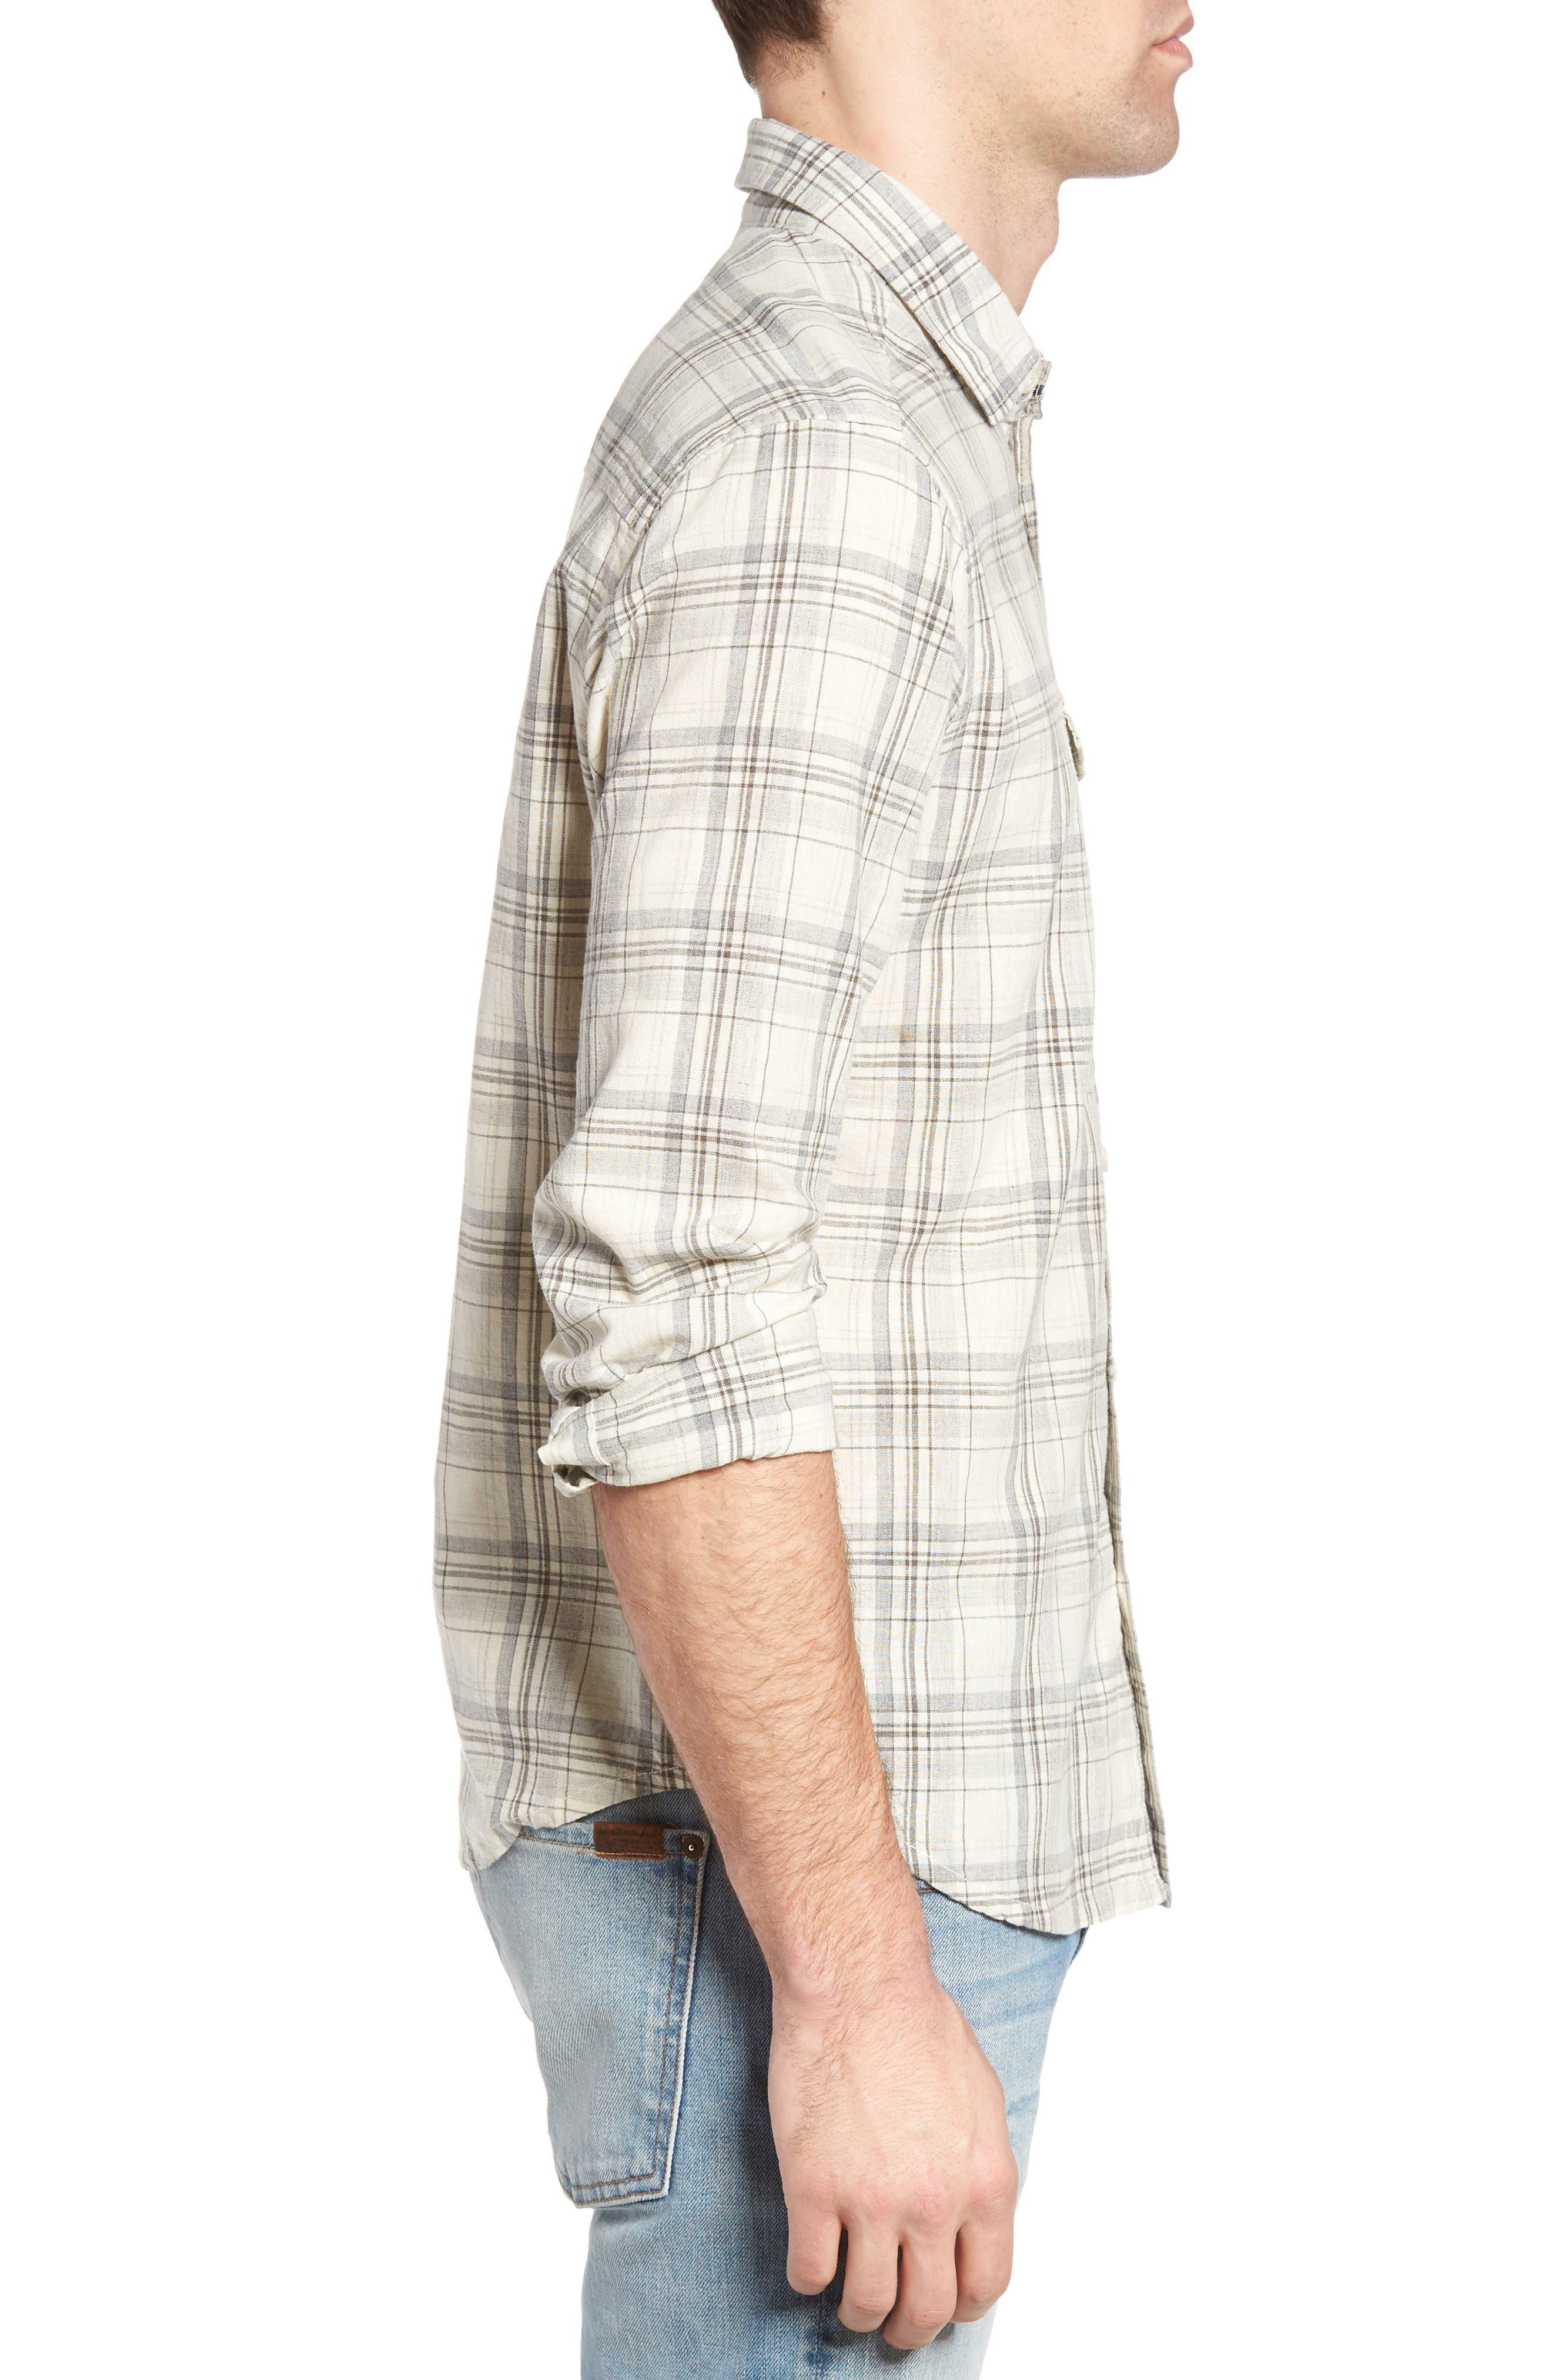 Henri Regular Fit Plaid Cotton & Linen Sport Shirt,                             Alternate thumbnail 3, color,                             280